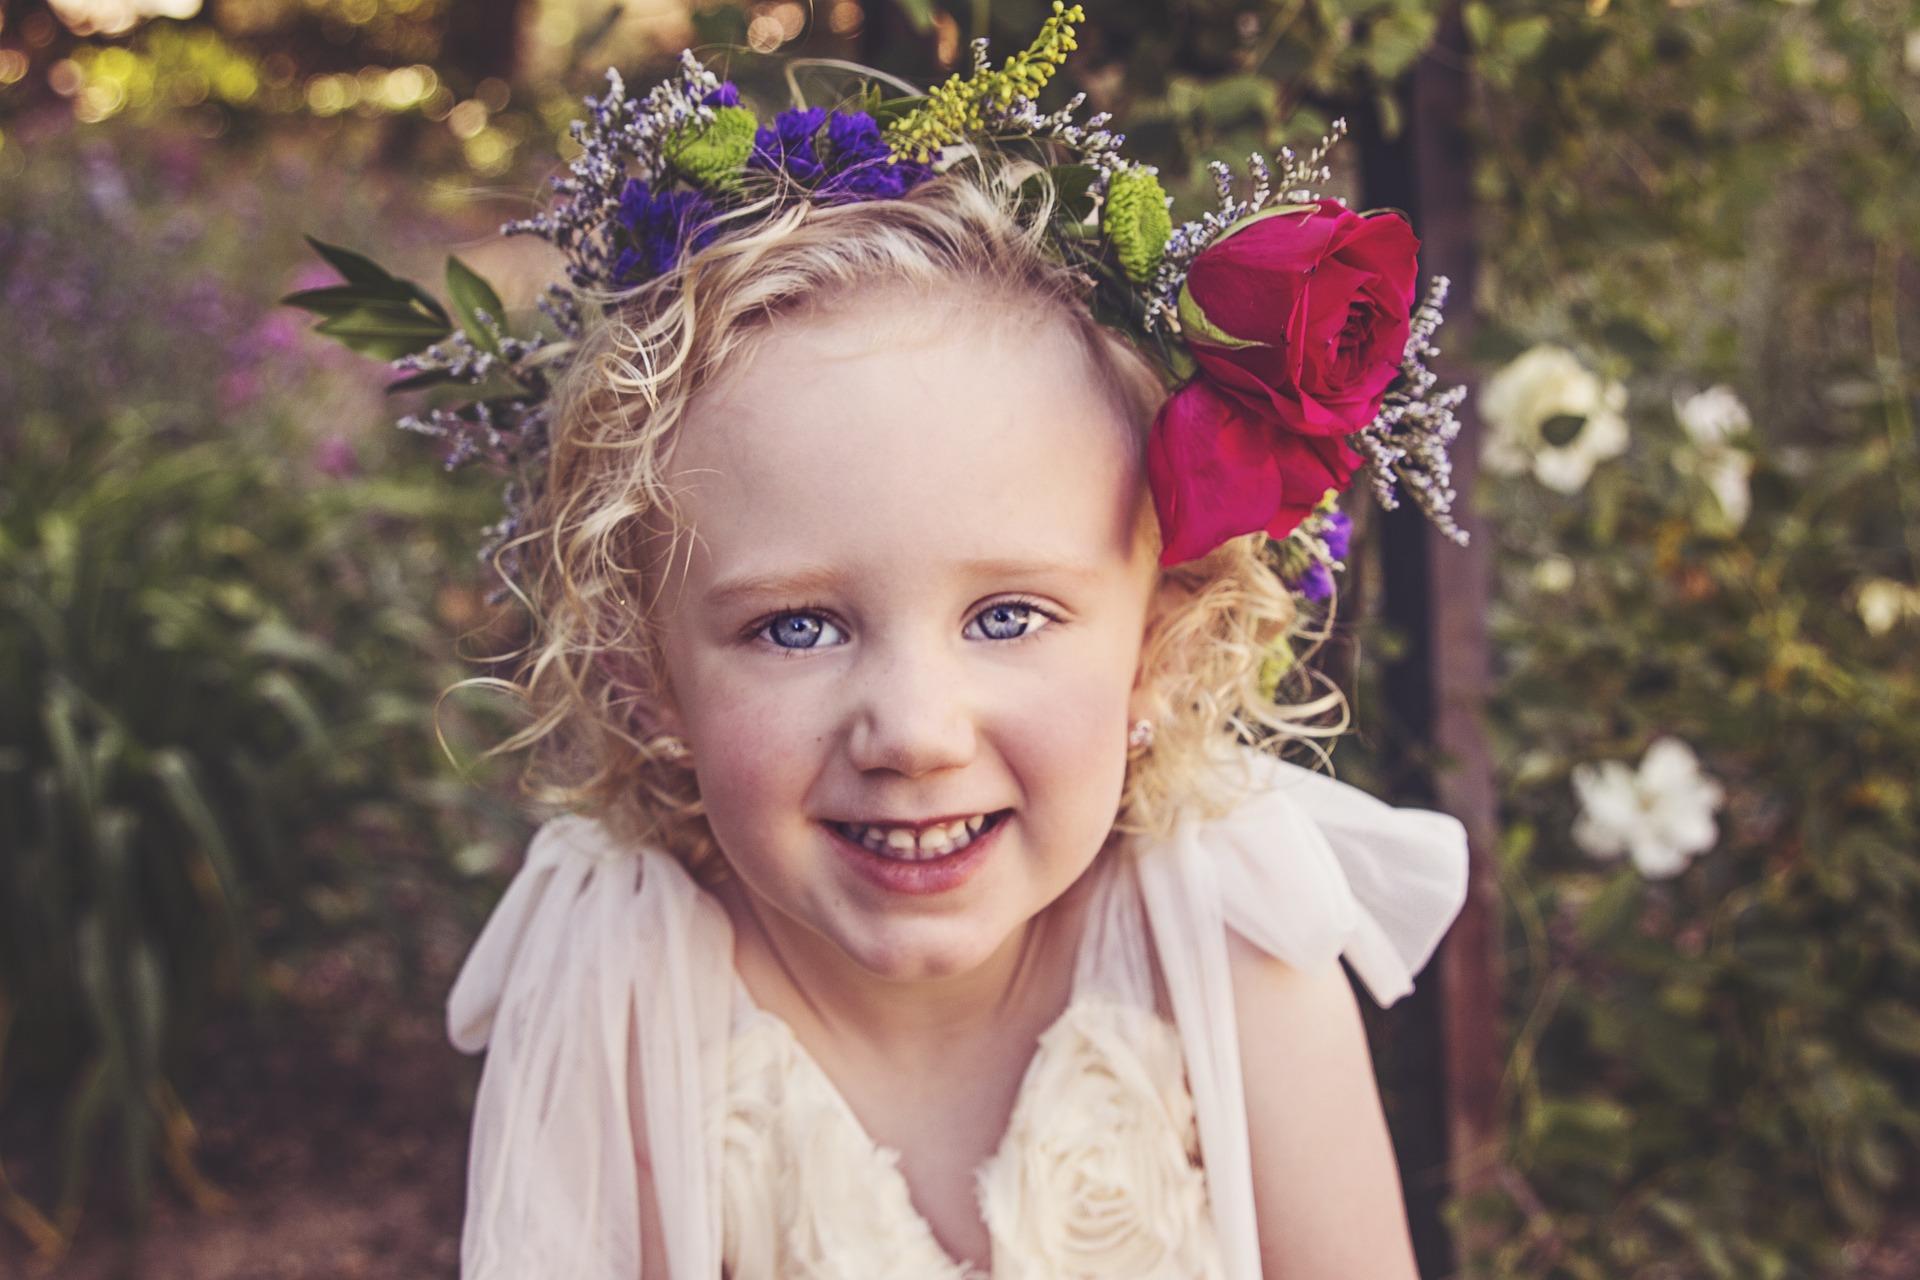 flower girl gifts Purple flower girl crown Rustic festival headpiece